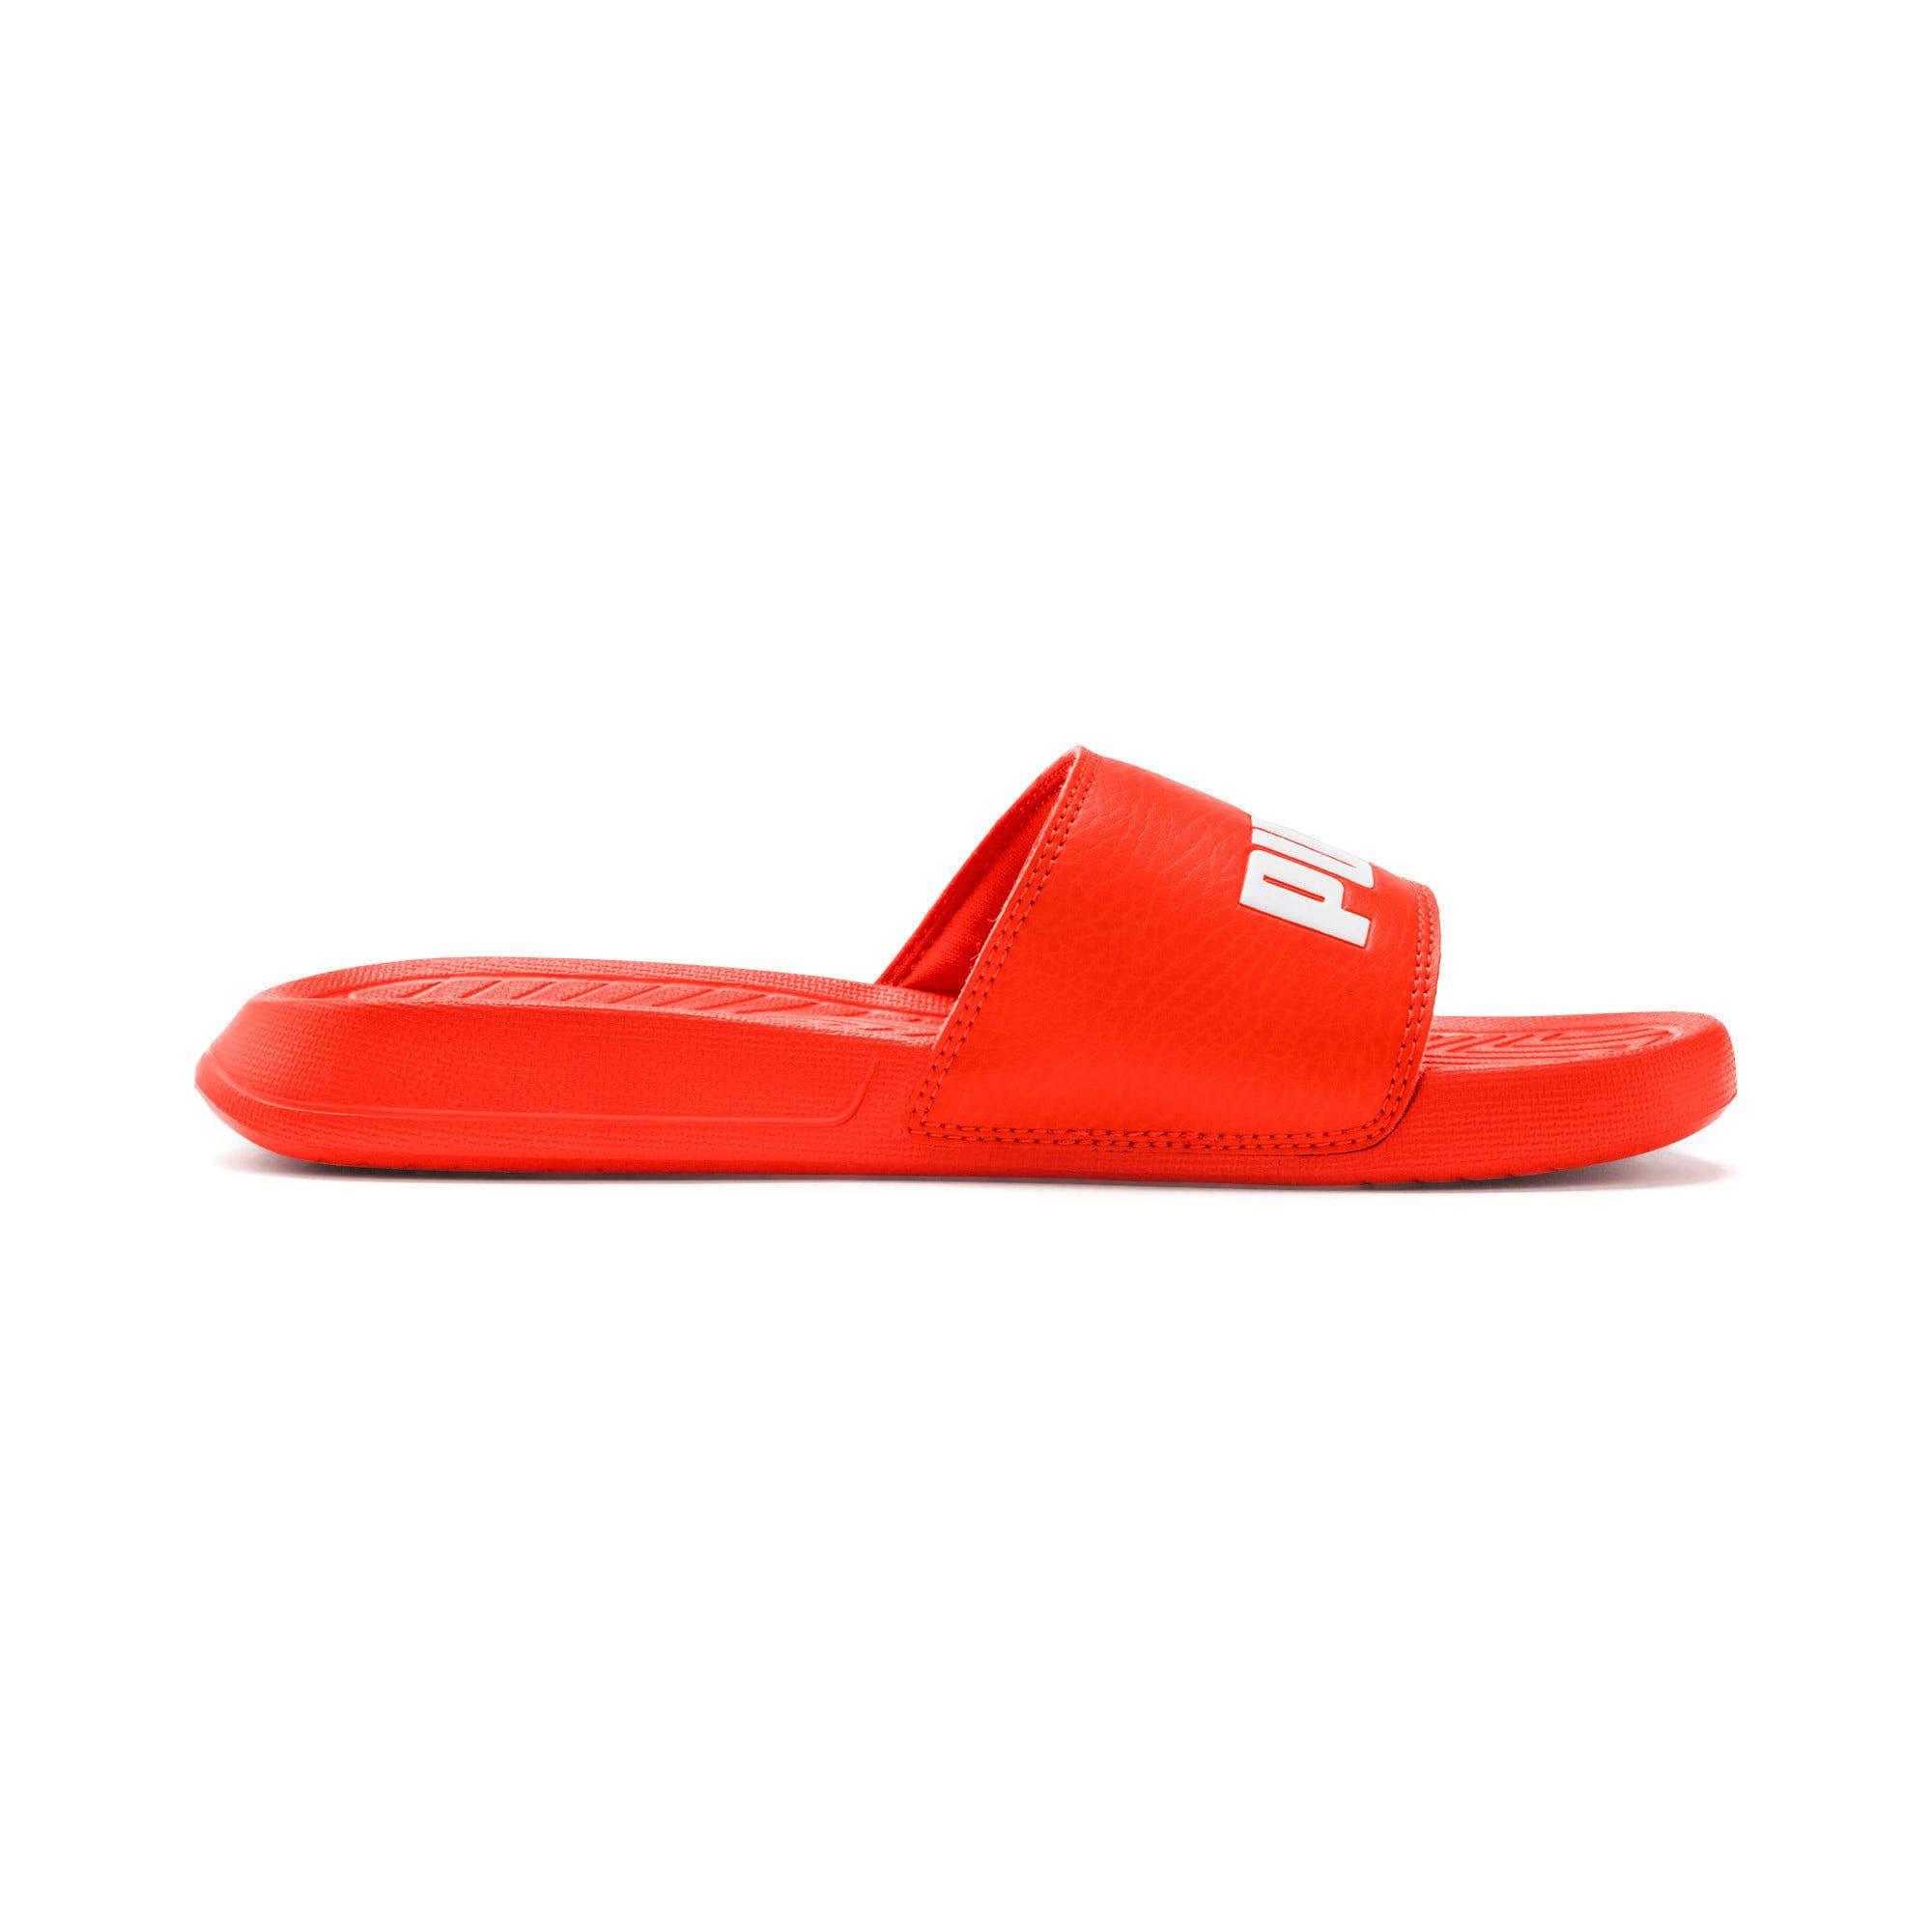 Thumbnail 3 of Popcat Youth Sandal, Cherry Tomato-Puma White, medium-IND